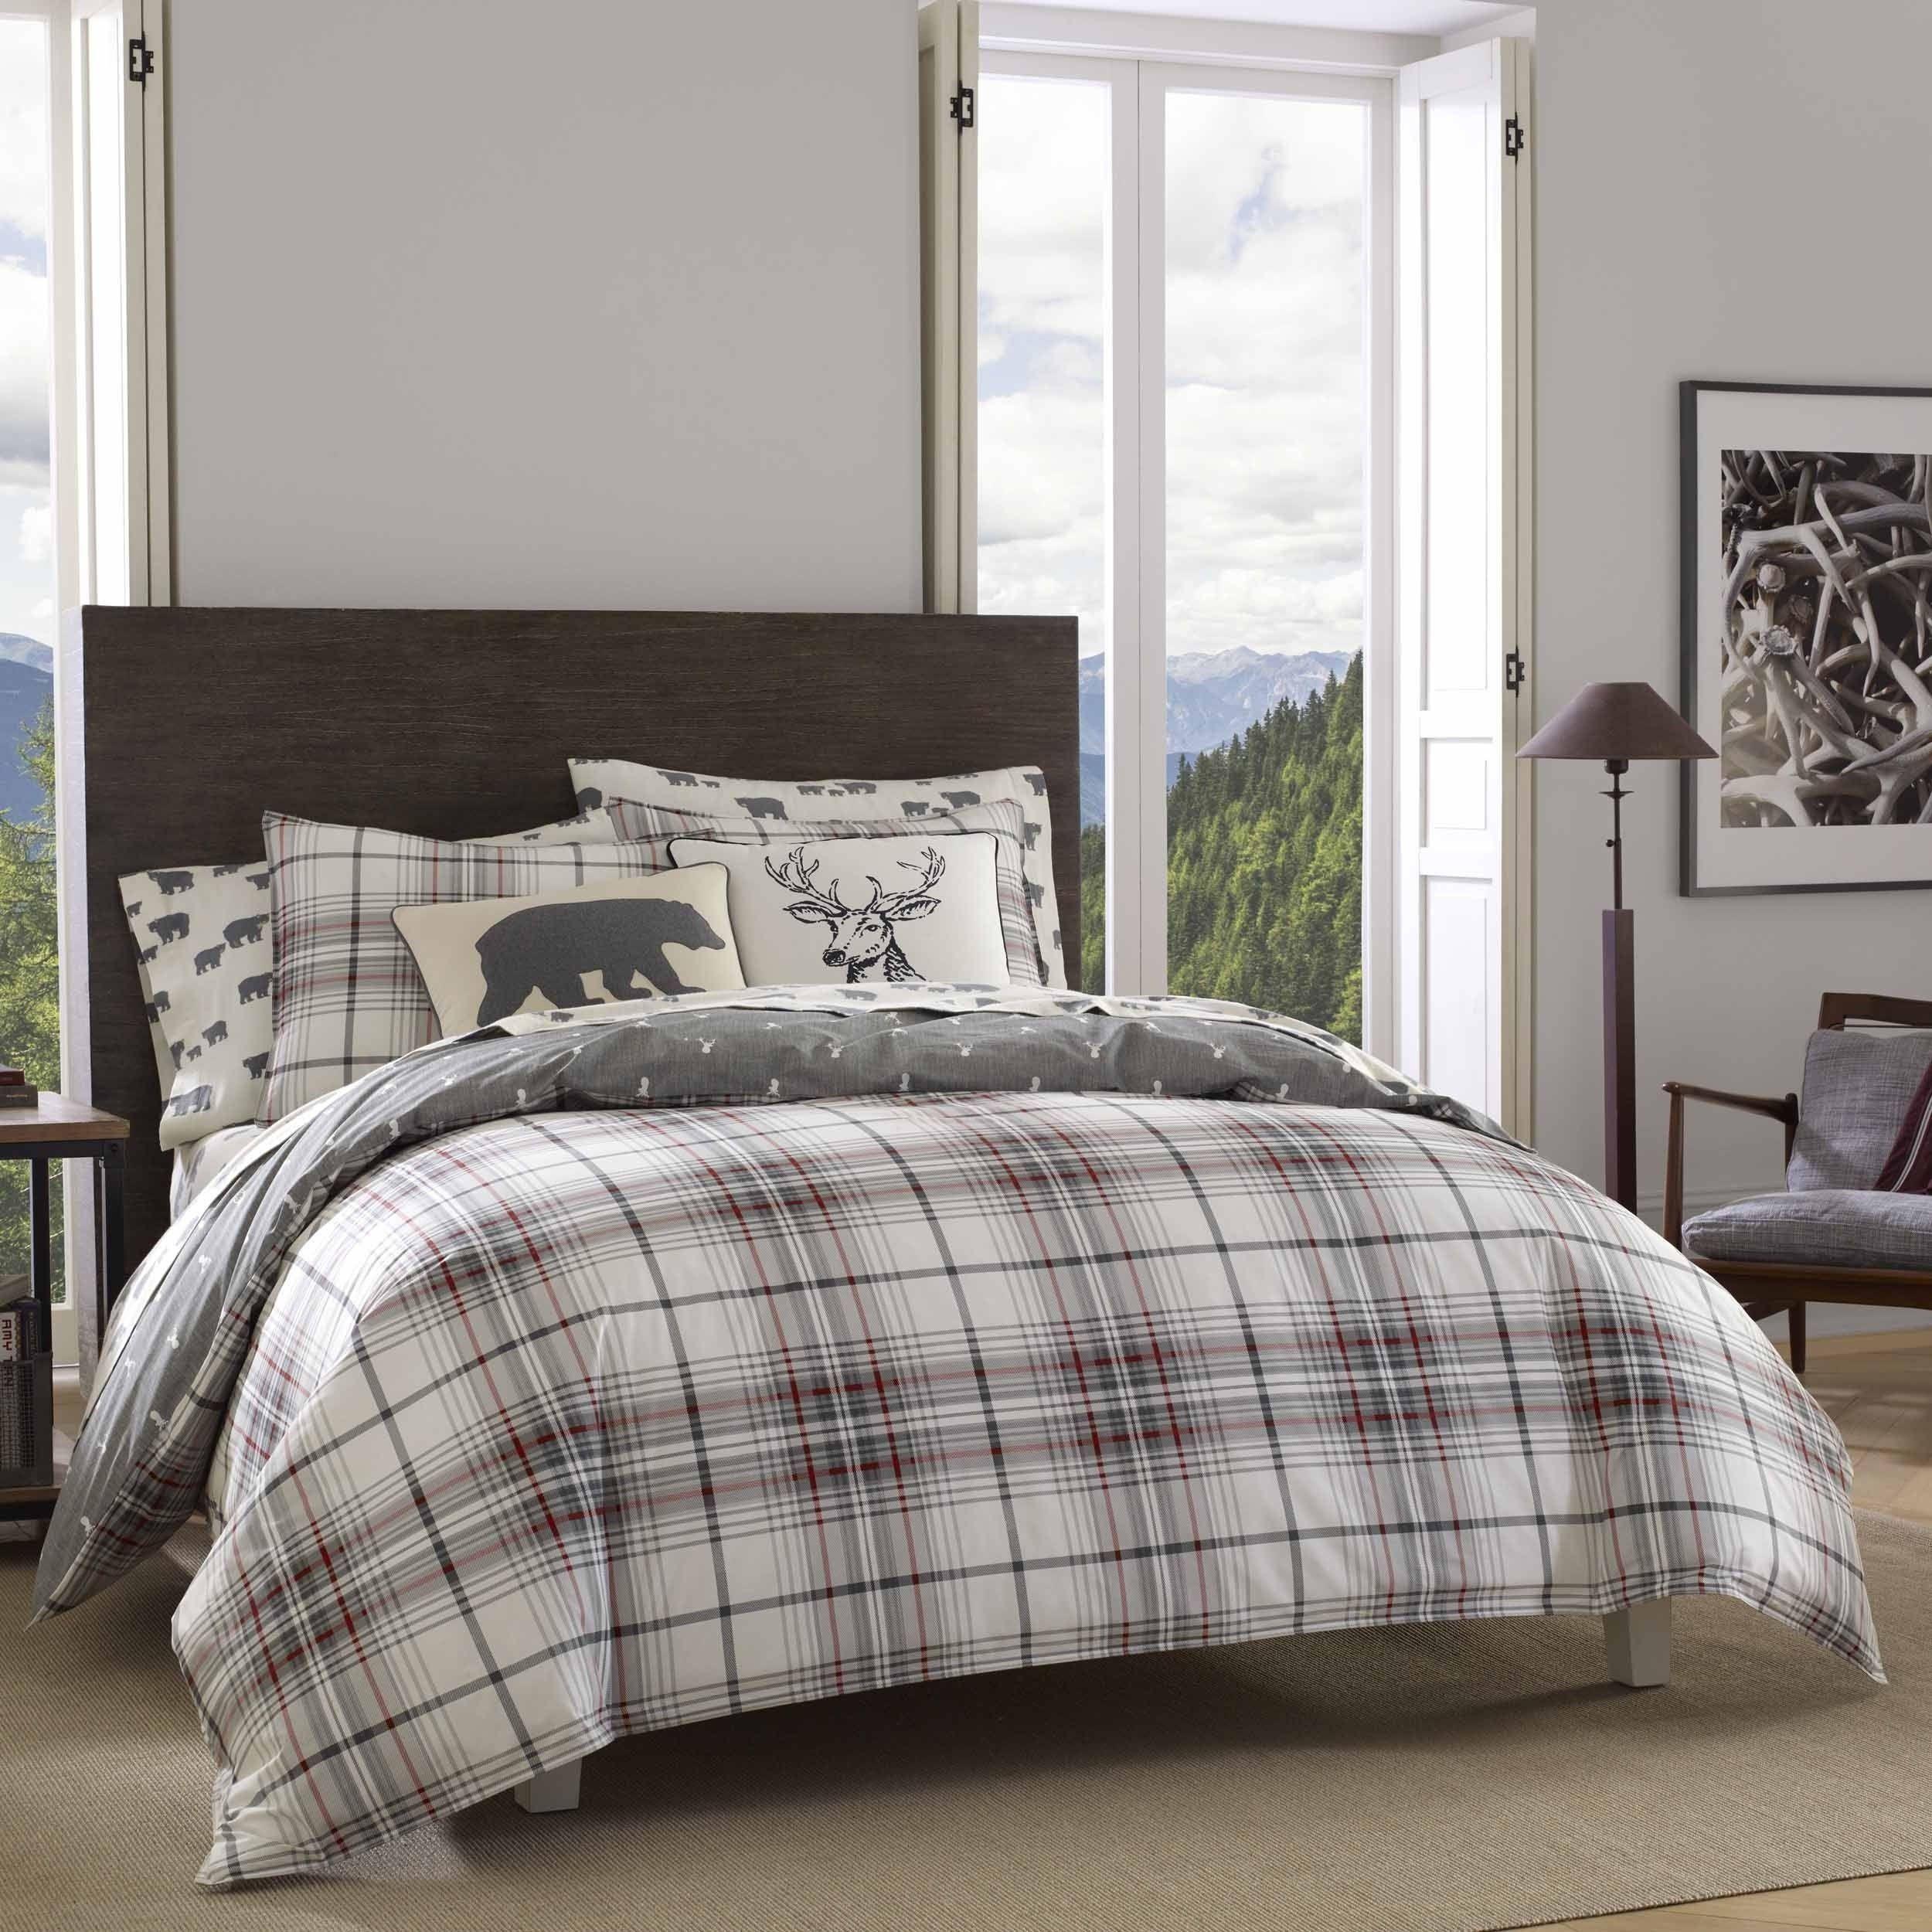 Eddie Bauer Alder Plaid Duvet Cover Set Full Queen White Products Duvet Bedding Plaid Bedding Plaid Comforter